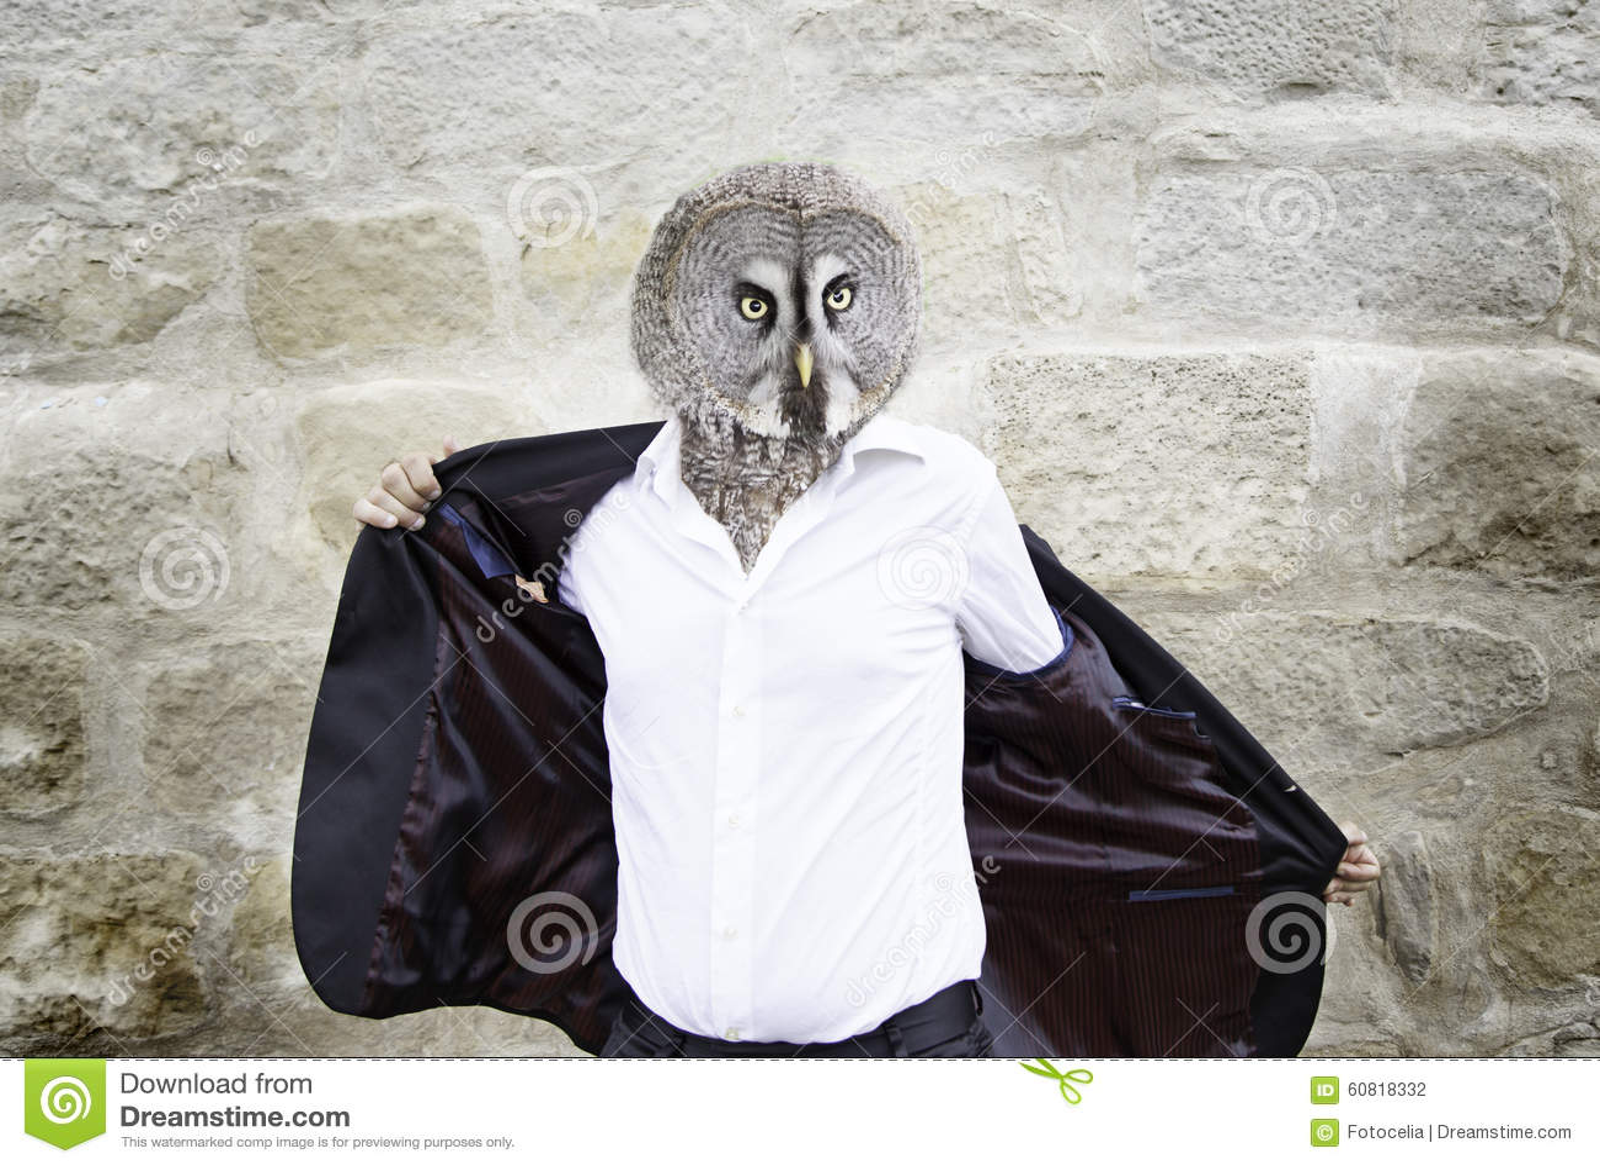 Owl Man Stock Photo Image 60818332